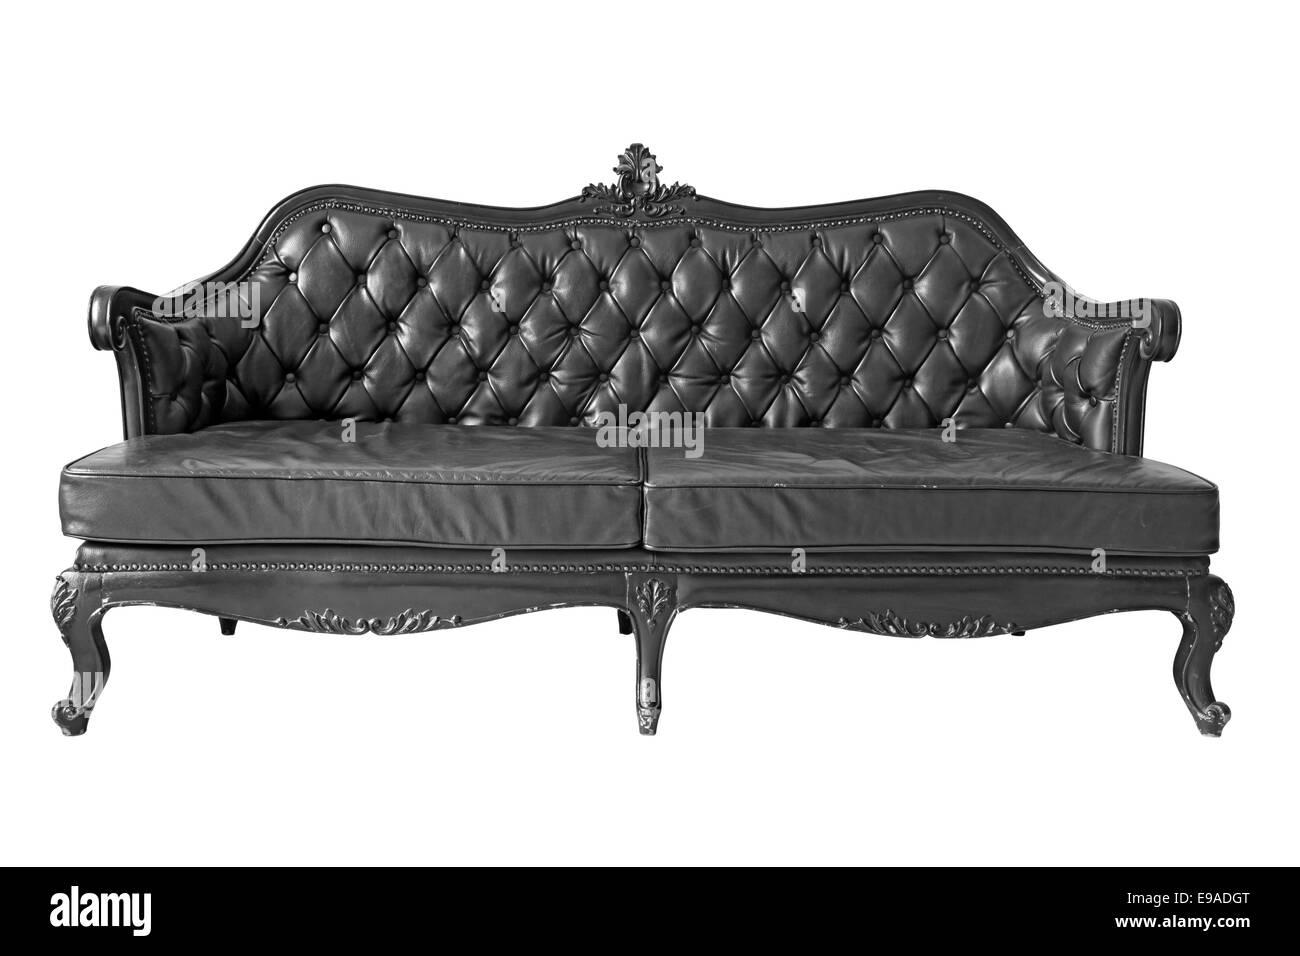 schwarzes ledersofa stockfoto bild 74603560 alamy. Black Bedroom Furniture Sets. Home Design Ideas